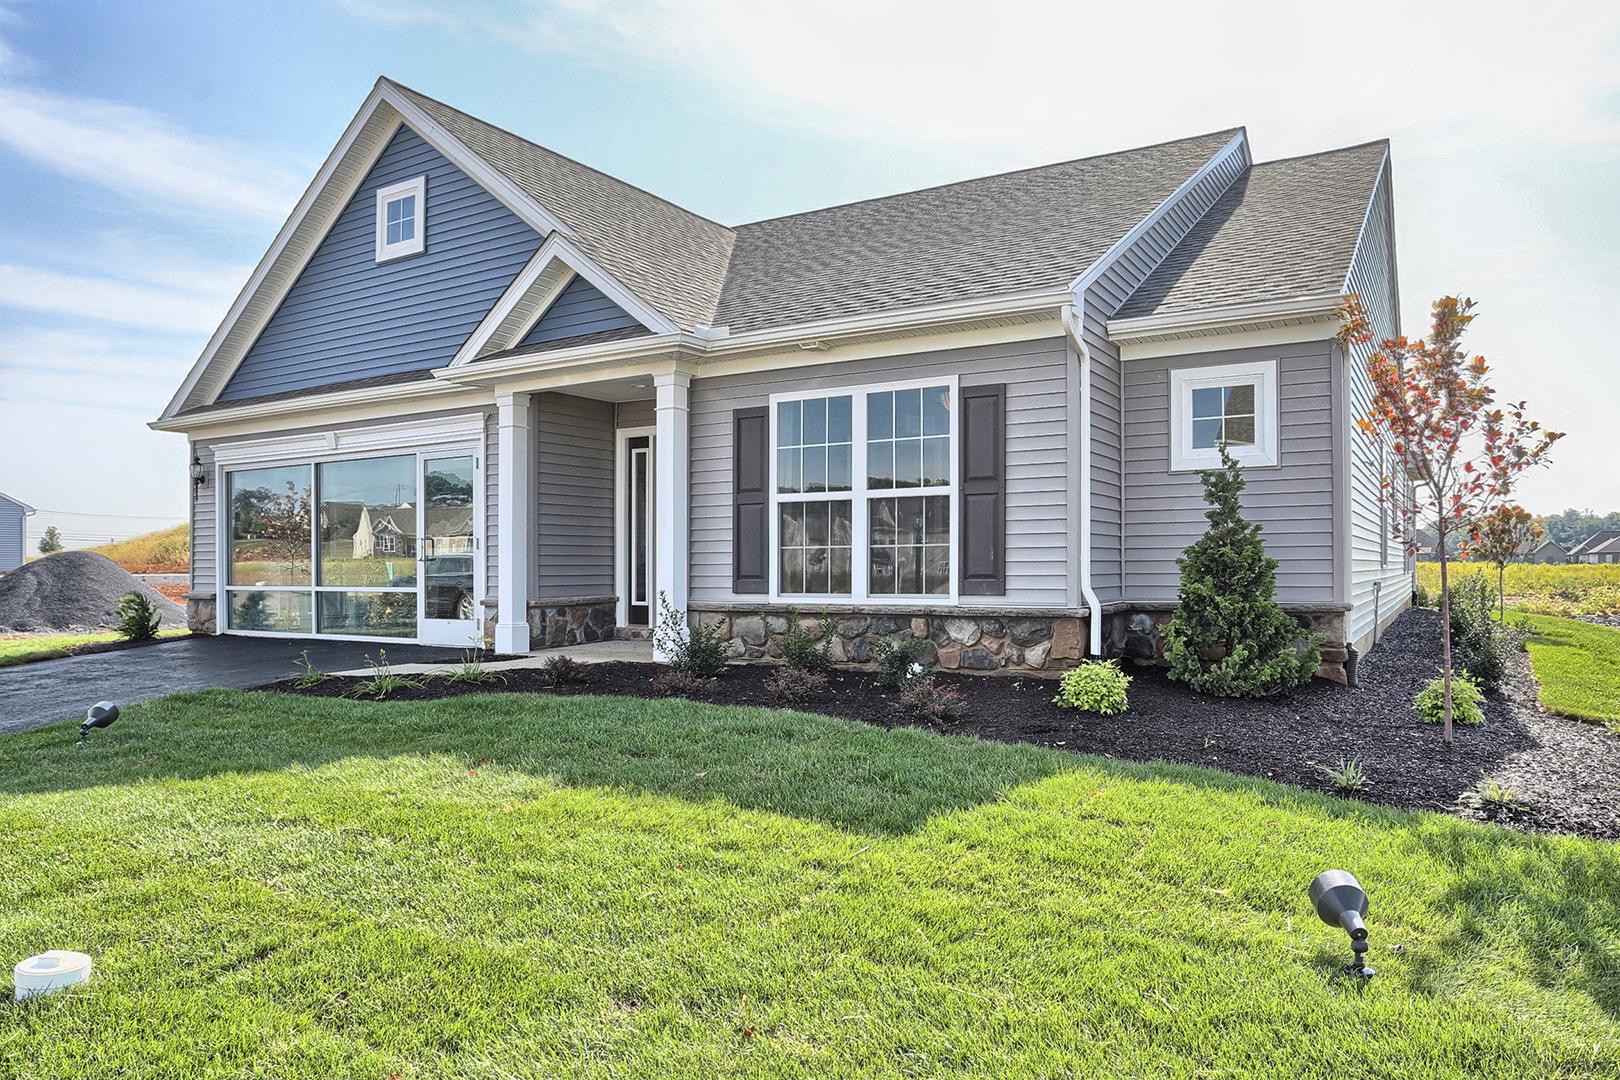 Fairview ridge harrisburg real estate teampete realty for Fairview custom homes